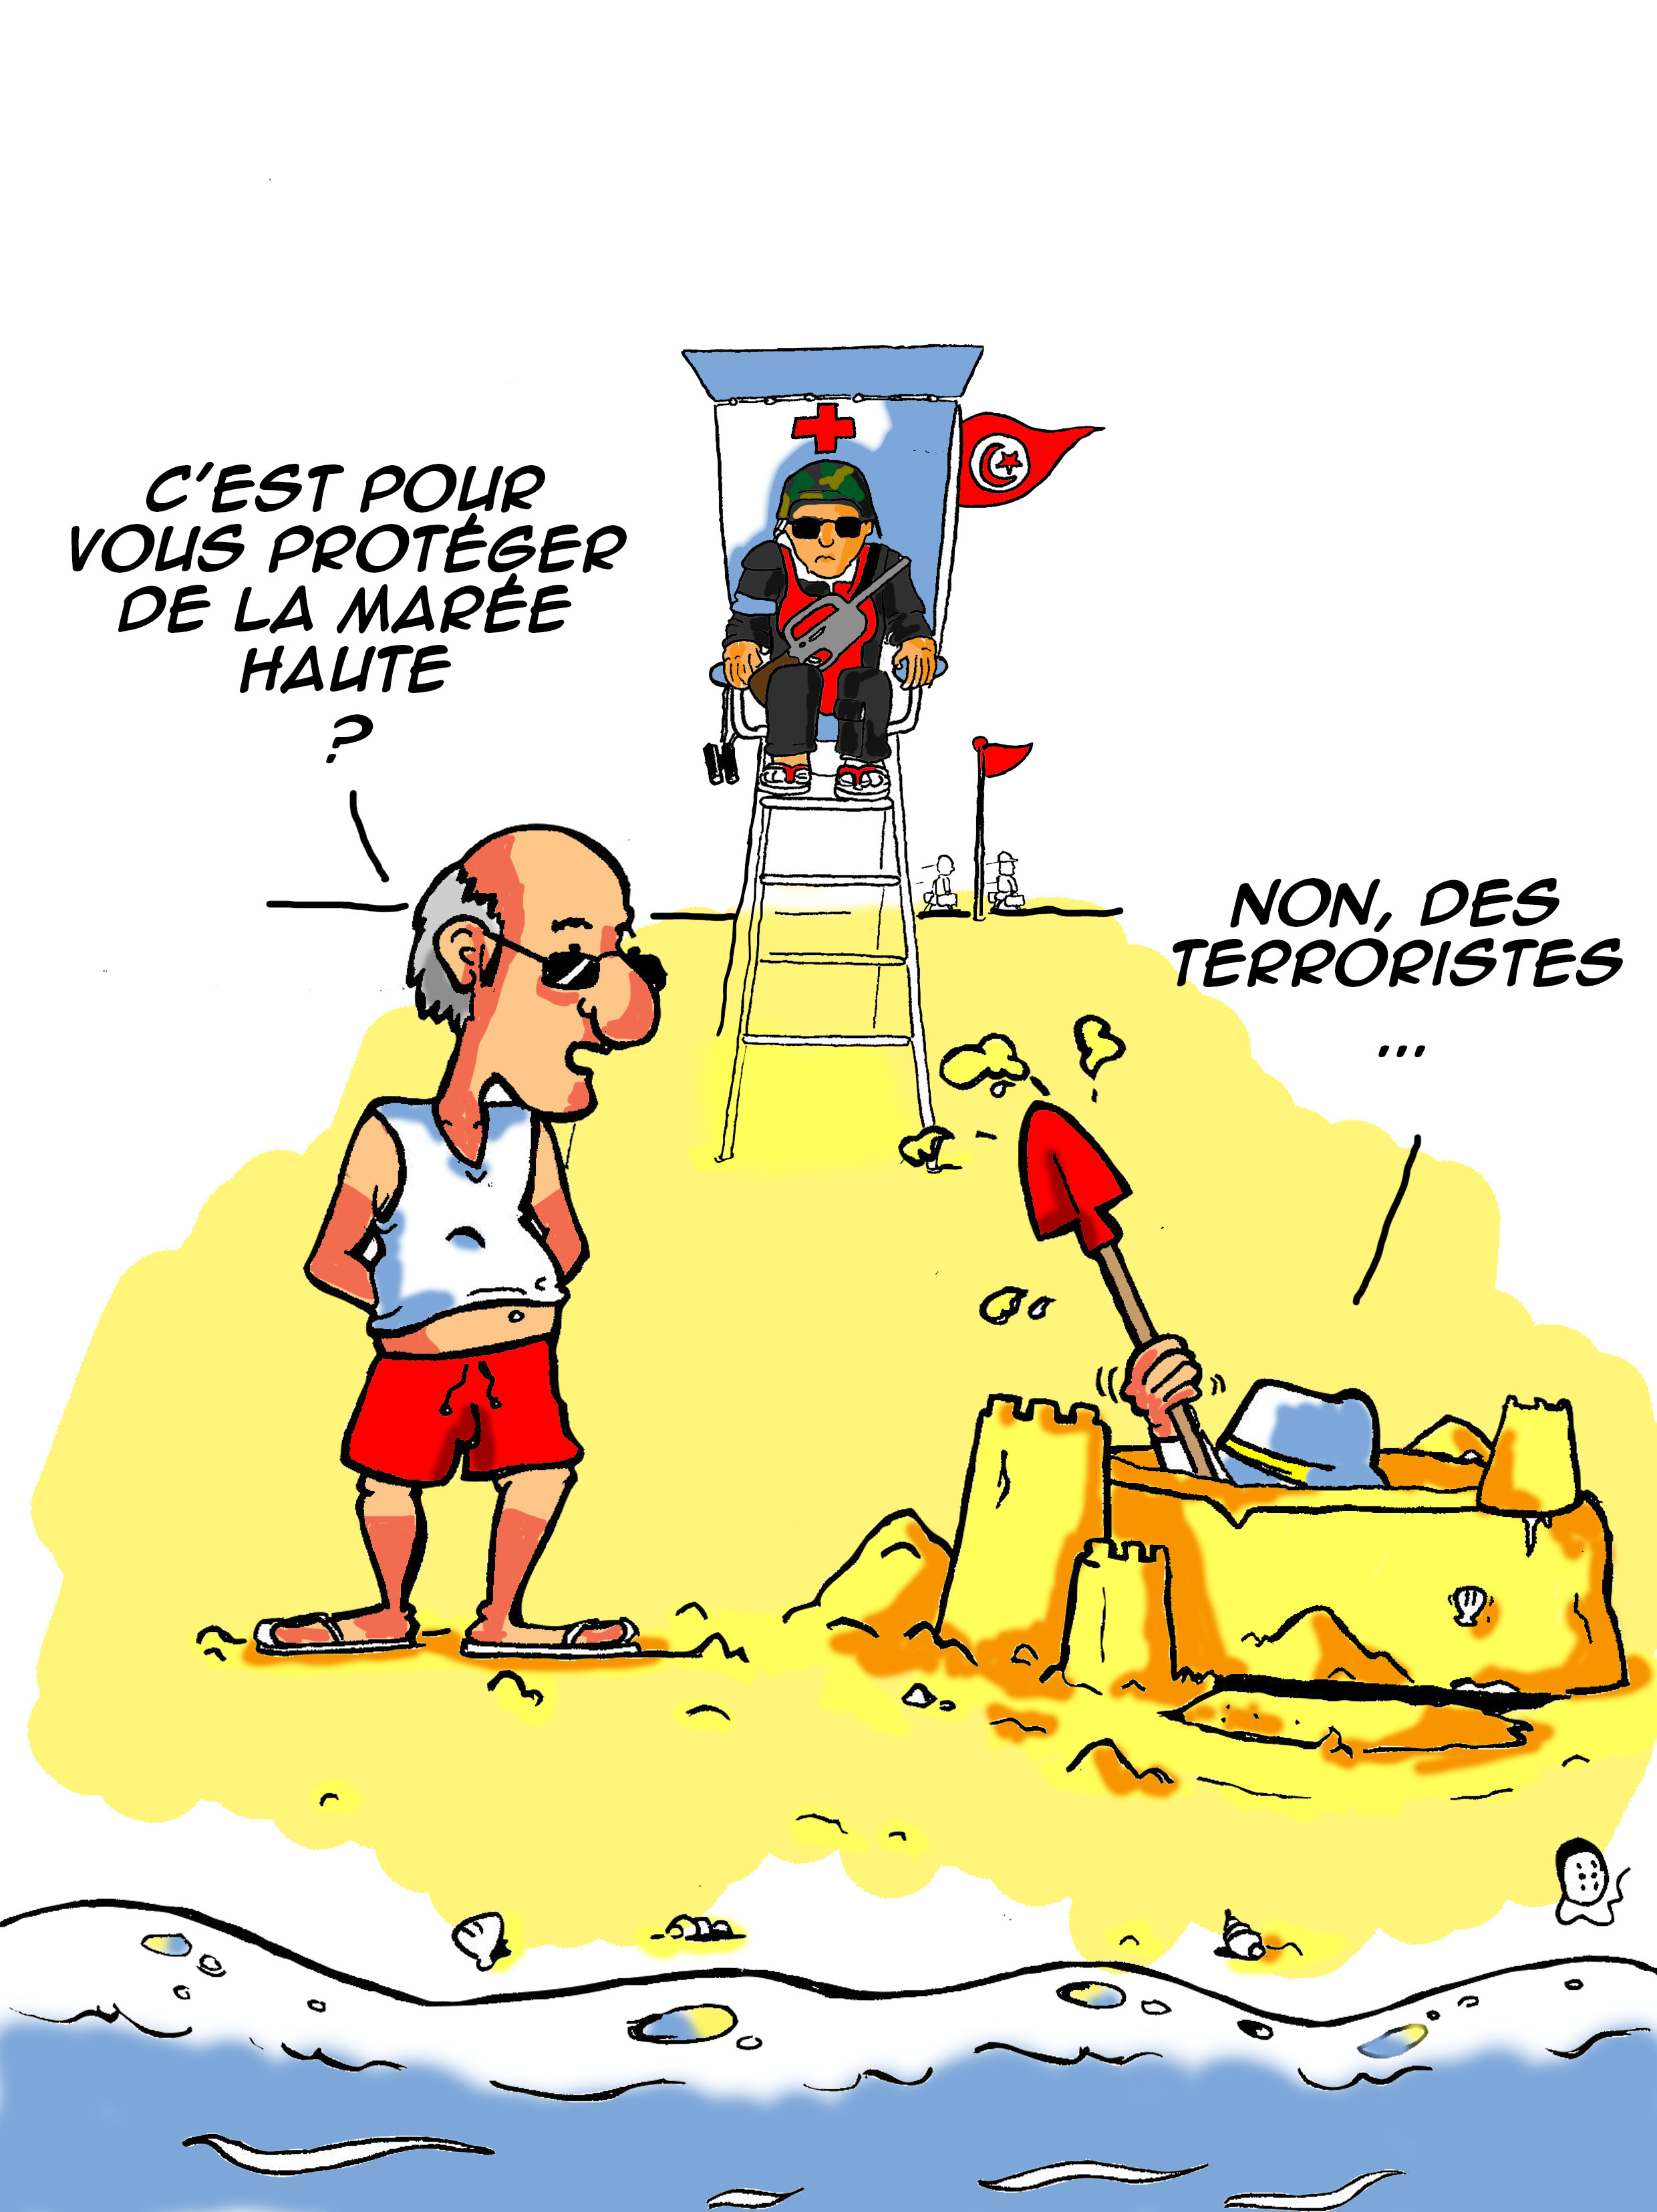 Crédit : Pierre Lecornu